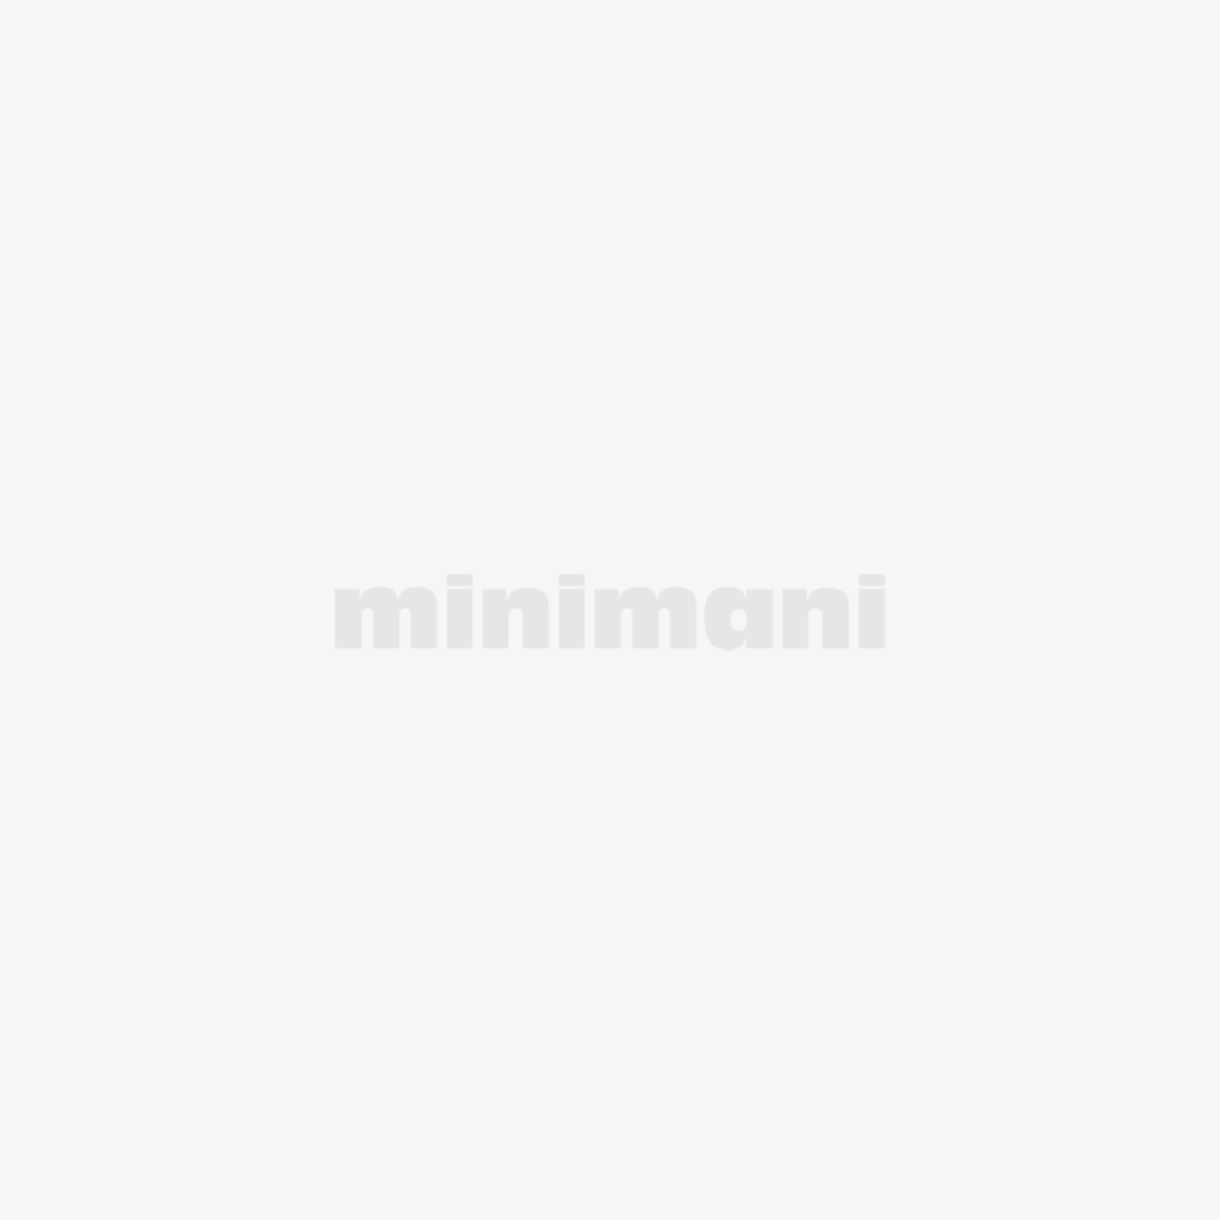 Vallila matto 160x230cm, Kelohonka harmaa